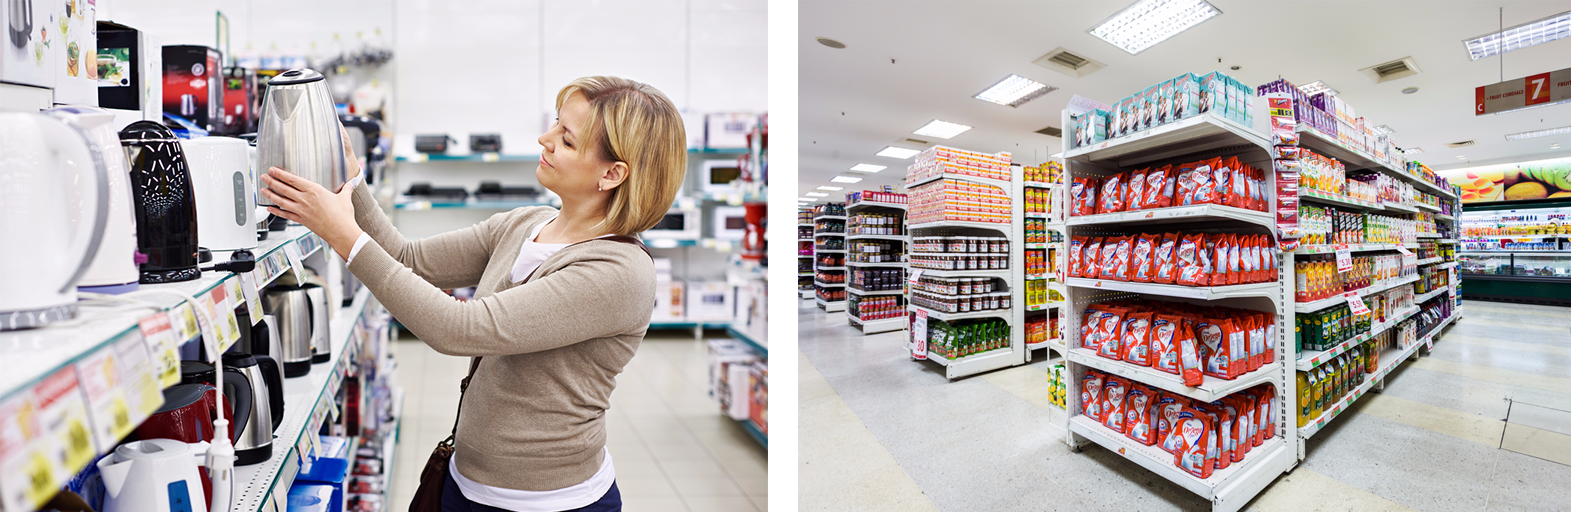 led retail lighting - bright stores